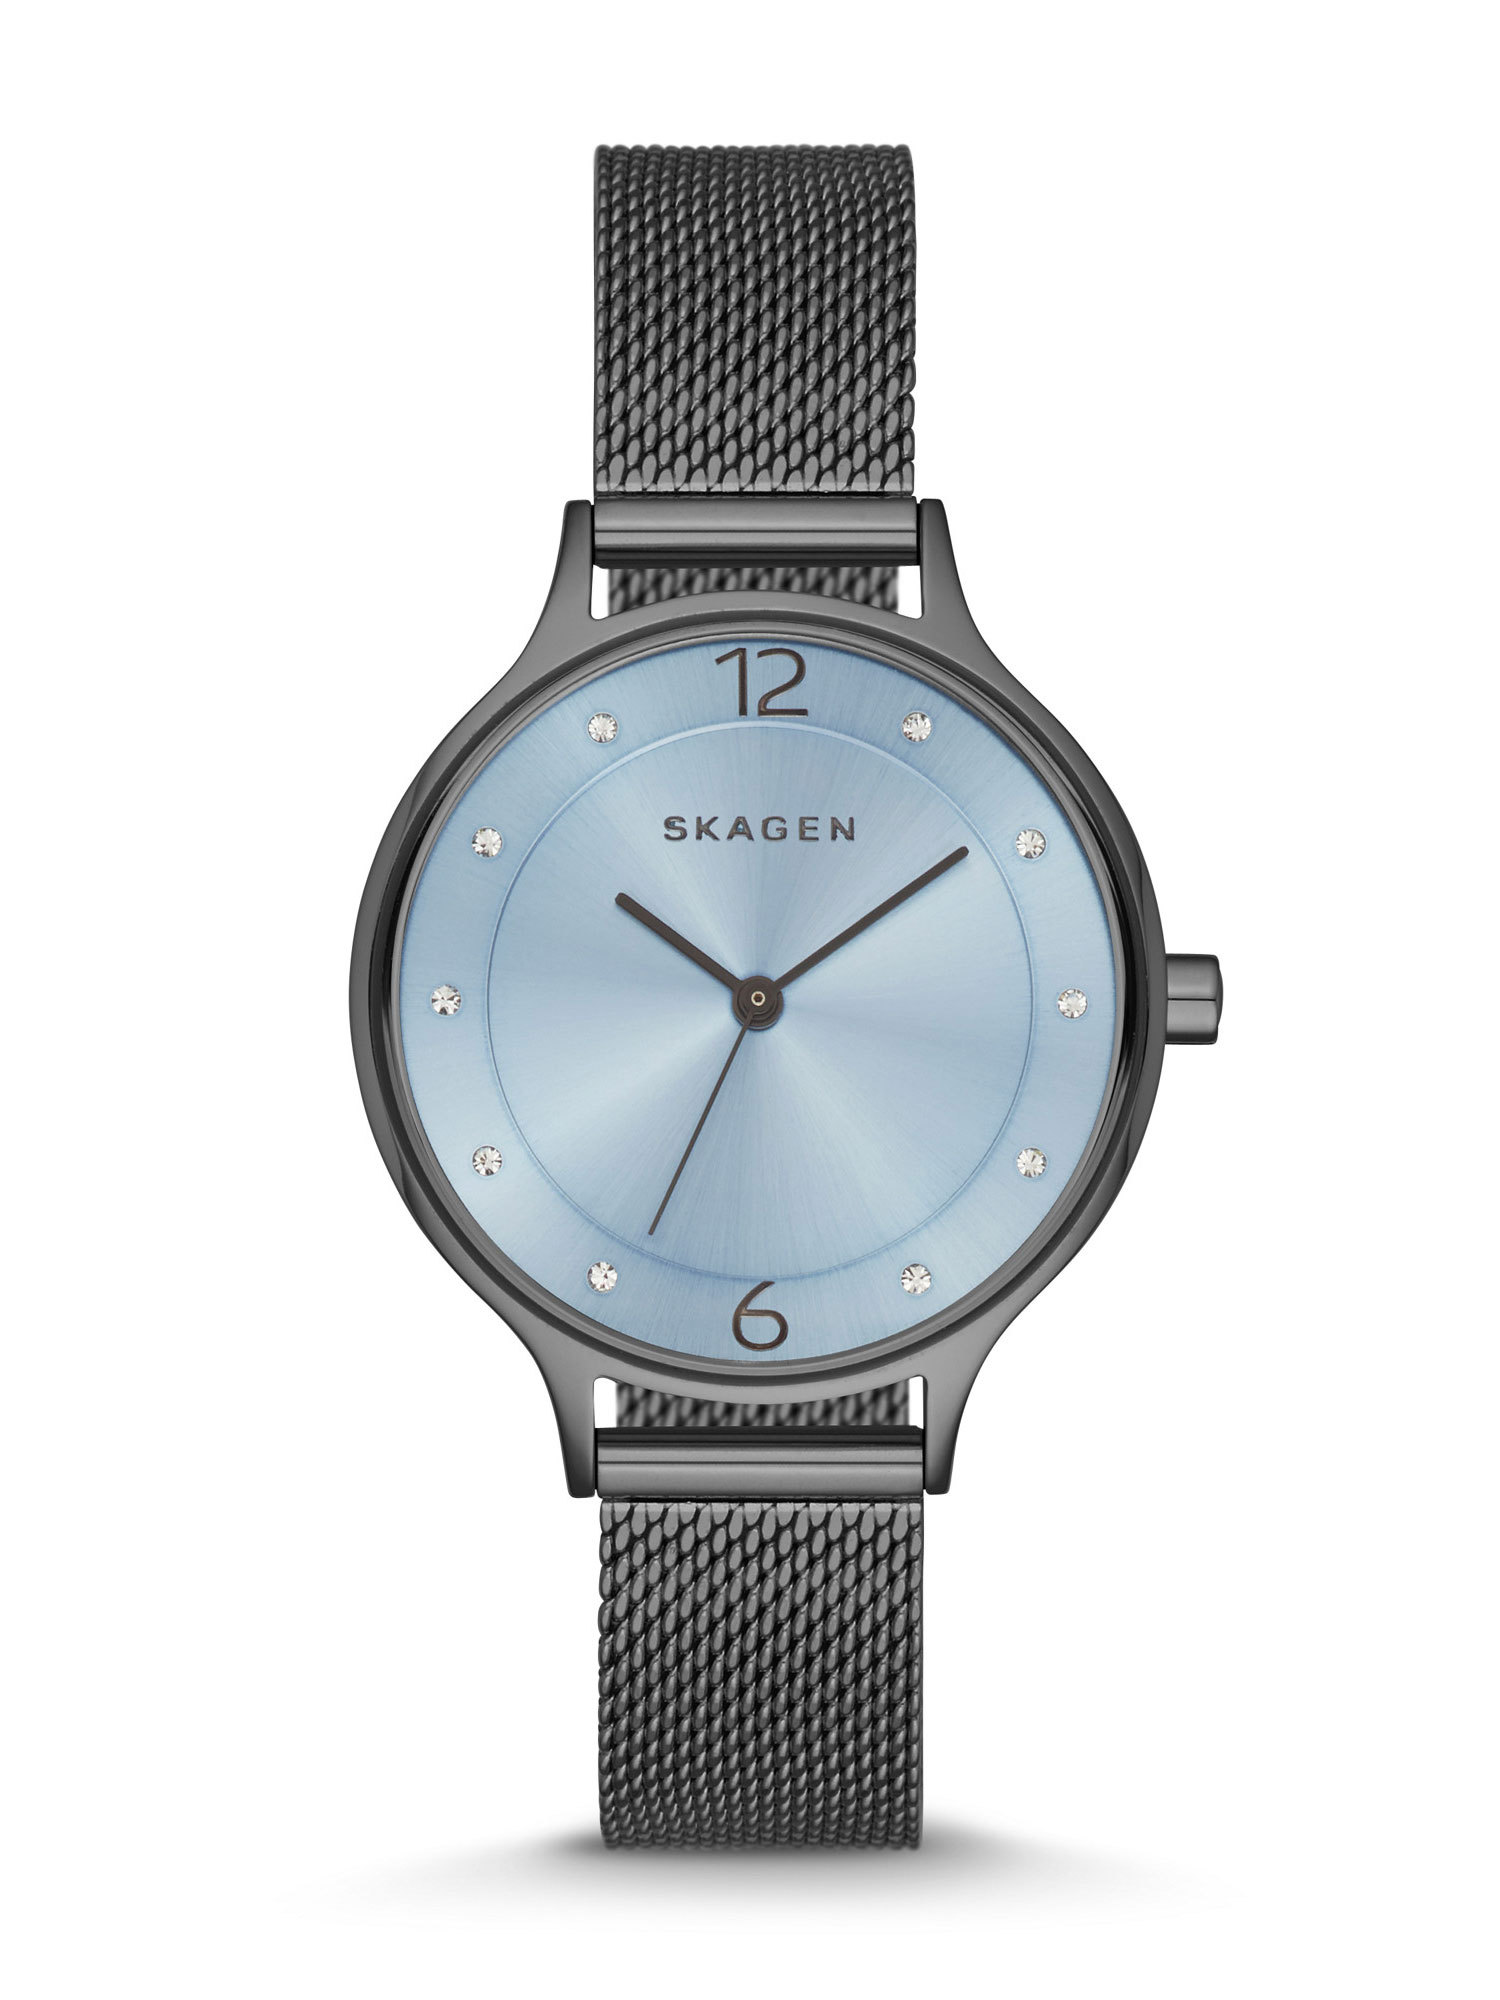 Skagen SKW2308 - женские наручные часы из коллекции MeshSkagen<br><br><br>Бренд: Skagen<br>Модель: Skagen SKW2308<br>Артикул: SKW2308<br>Вариант артикула: None<br>Коллекция: Mesh<br>Подколлекция: None<br>Страна: Дания<br>Пол: женские<br>Тип механизма: кварцевые<br>Механизм: None<br>Количество камней: None<br>Автоподзавод: None<br>Источник энергии: от батарейки<br>Срок службы элемента питания: None<br>Дисплей: стрелки<br>Цифры: арабские<br>Водозащита: WR 30<br>Противоударные: None<br>Материал корпуса: нерж. сталь<br>Материал браслета: нерж. сталь<br>Материал безеля: None<br>Стекло: минеральное<br>Антибликовое покрытие: None<br>Цвет корпуса: None<br>Цвет браслета: None<br>Цвет циферблата: None<br>Цвет безеля: None<br>Размеры: 30x7 мм<br>Диаметр: None<br>Диаметр корпуса: None<br>Толщина: None<br>Ширина ремешка: None<br>Вес: None<br>Спорт-функции: None<br>Подсветка: None<br>Вставка: None<br>Отображение даты: None<br>Хронограф: None<br>Таймер: None<br>Термометр: None<br>Хронометр: None<br>GPS: None<br>Радиосинхронизация: None<br>Барометр: None<br>Скелетон: None<br>Дополнительная информация: None<br>Дополнительные функции: None